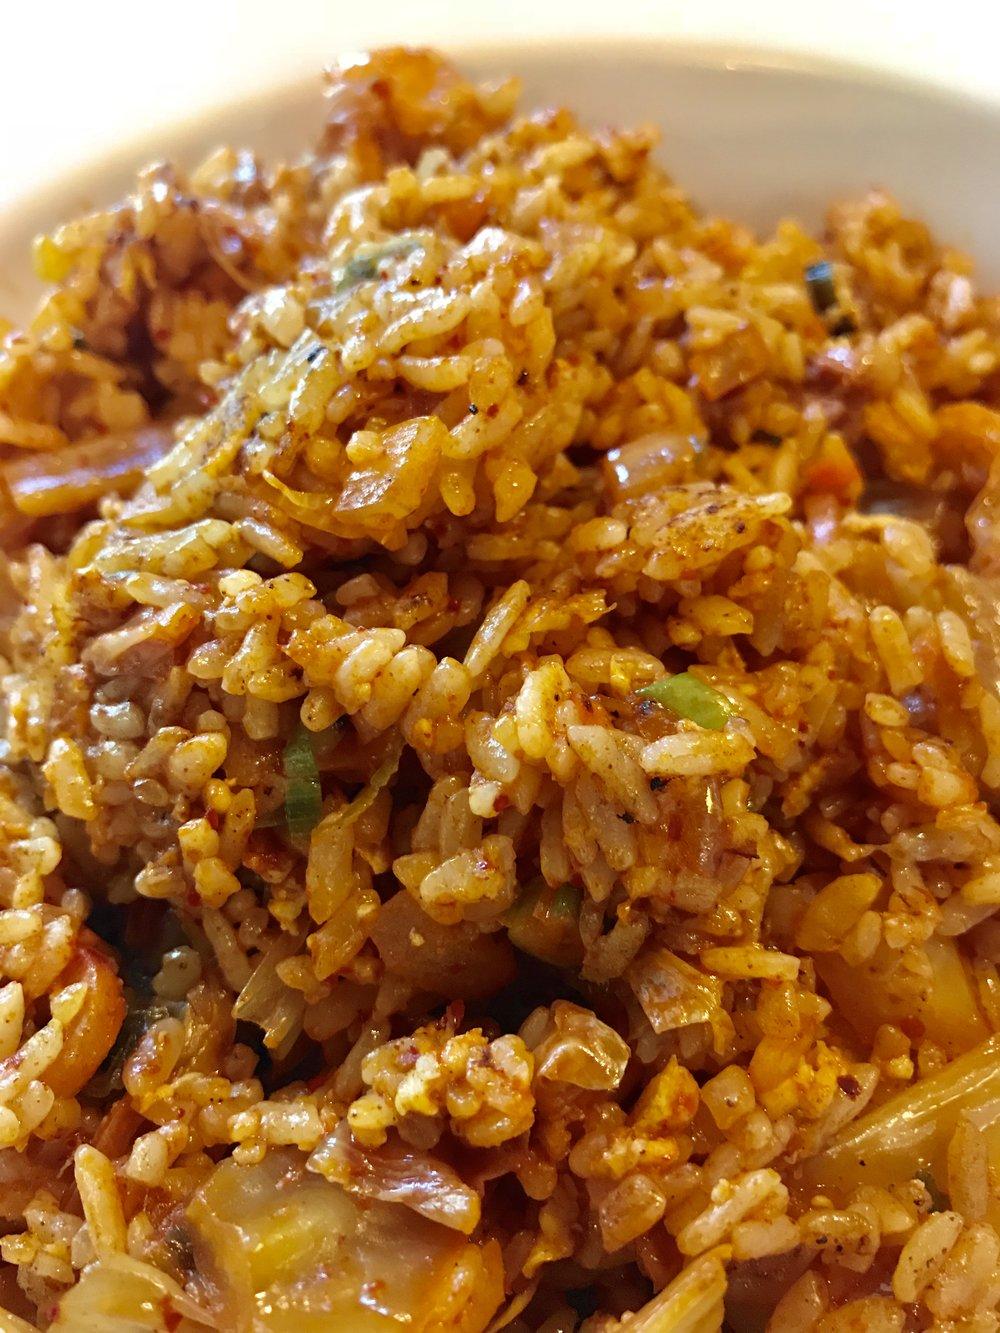 My favorite, Kimchi Fried Rice with Tofu! @WasabiKoreatown